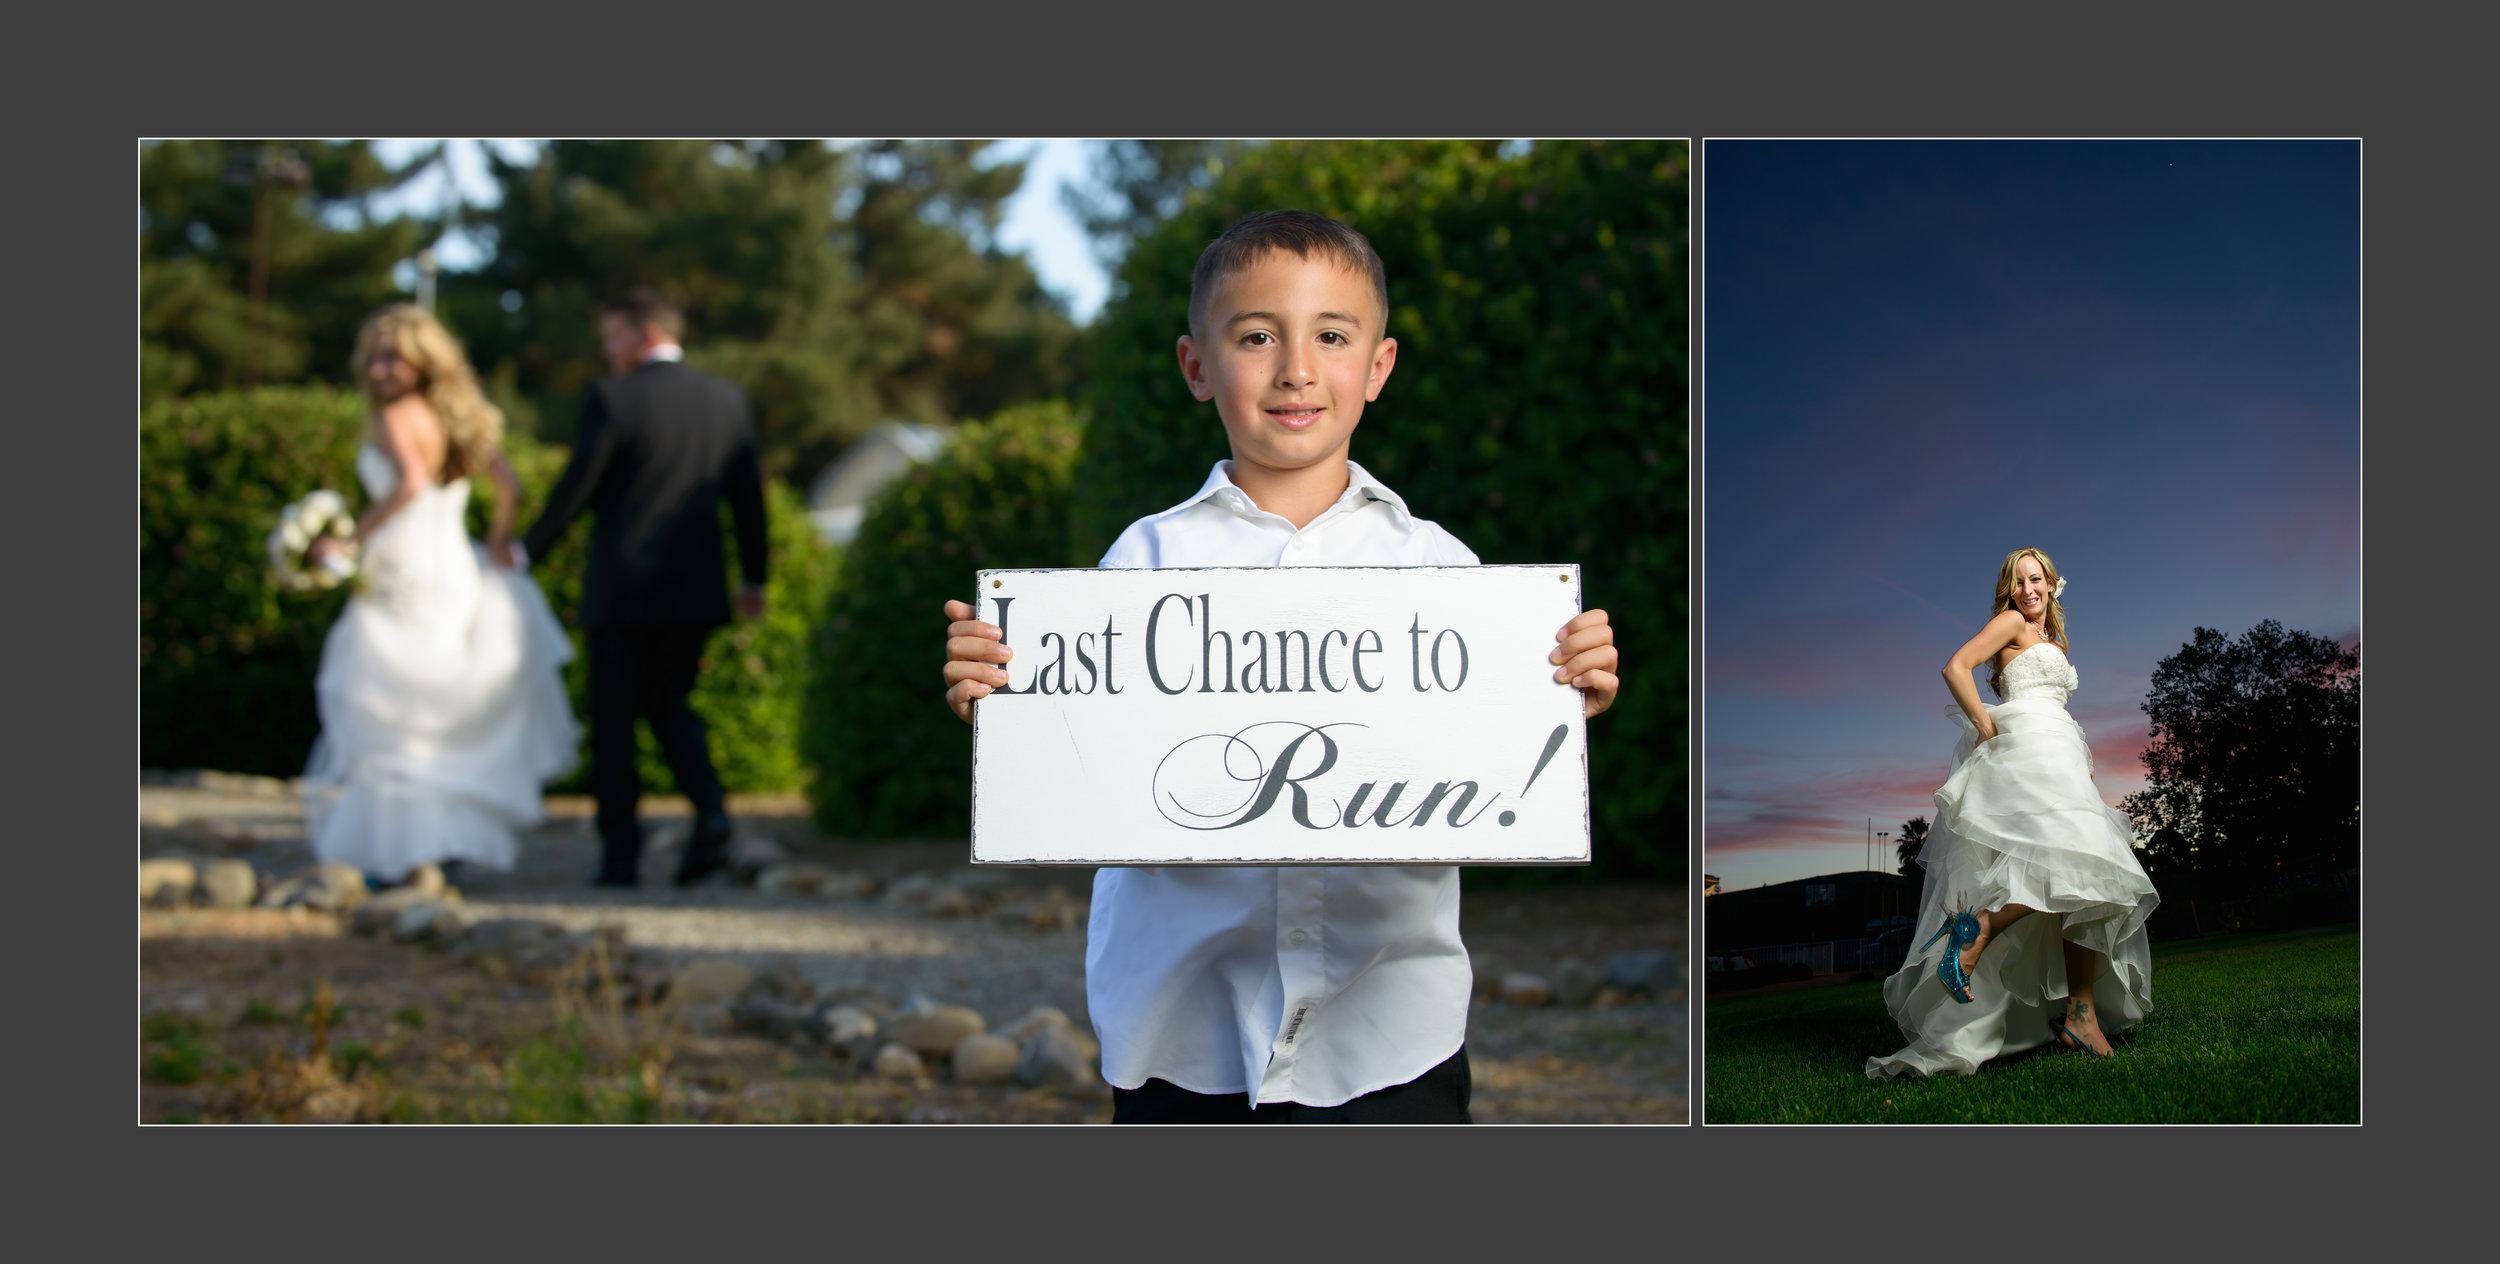 Last chance to run! Wedding photos taken by Chris Schmauch at Goularte Estate in San Martin, California.